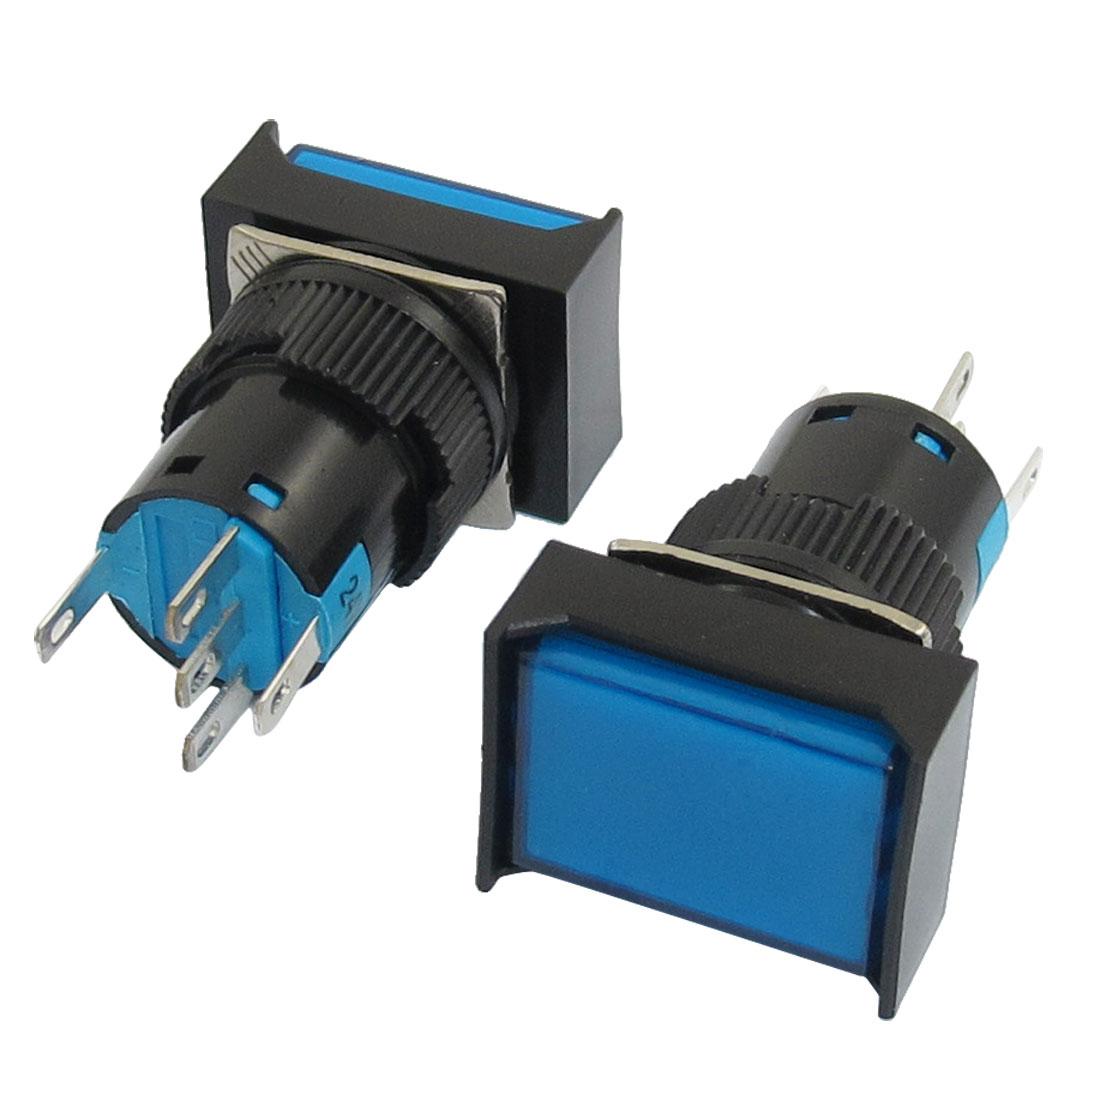 DC24V Lamp 1NO 1NC Latching Blue Cap Rectangular Push Button Switch 2Pcs